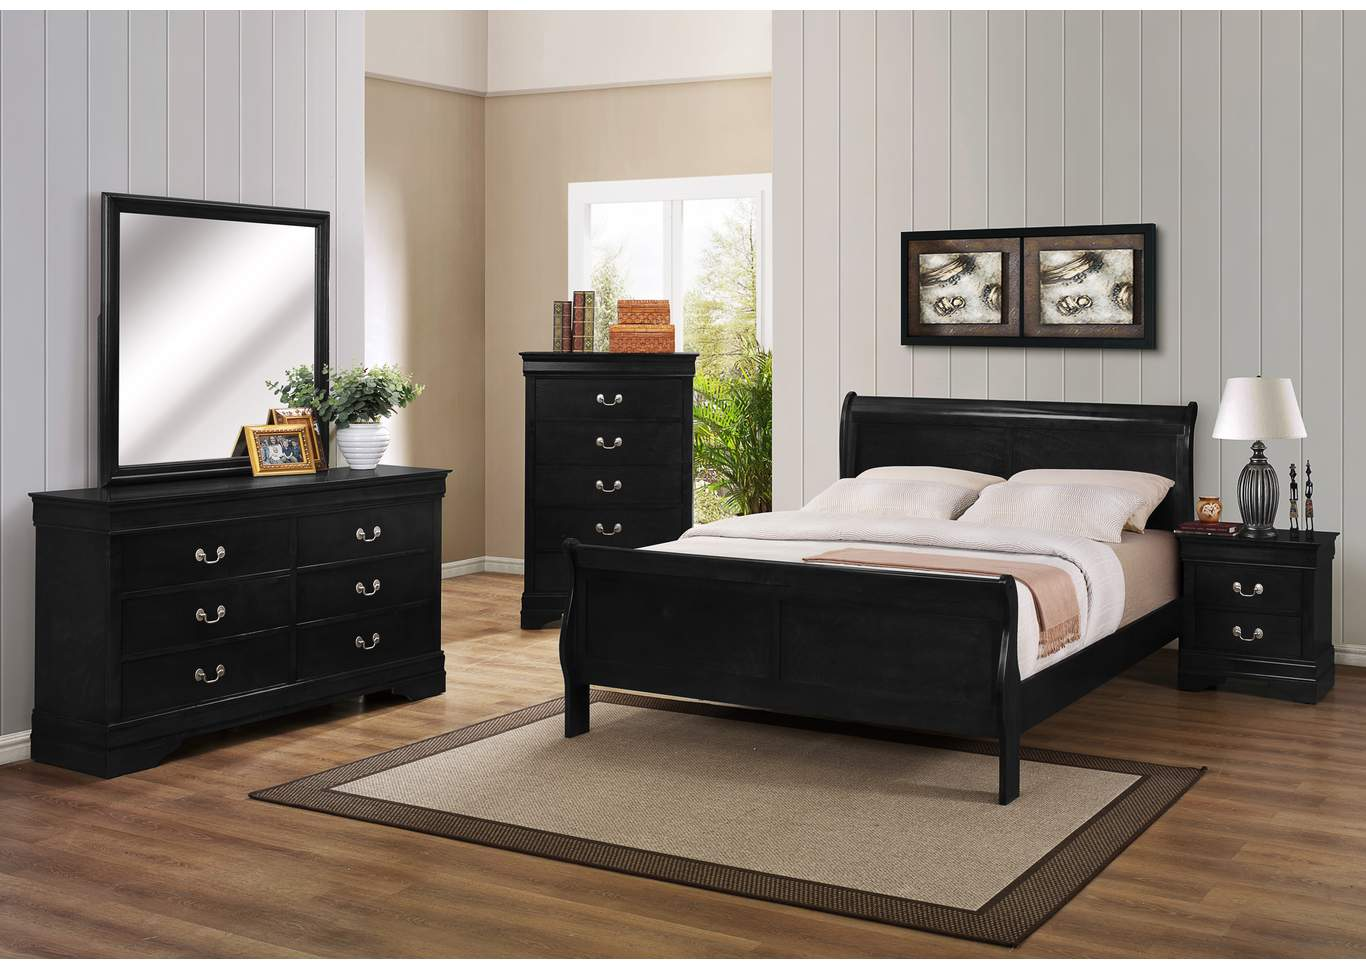 Orleans Furniture Louis Philip Black Twin Bed W6 Drawer Dresser